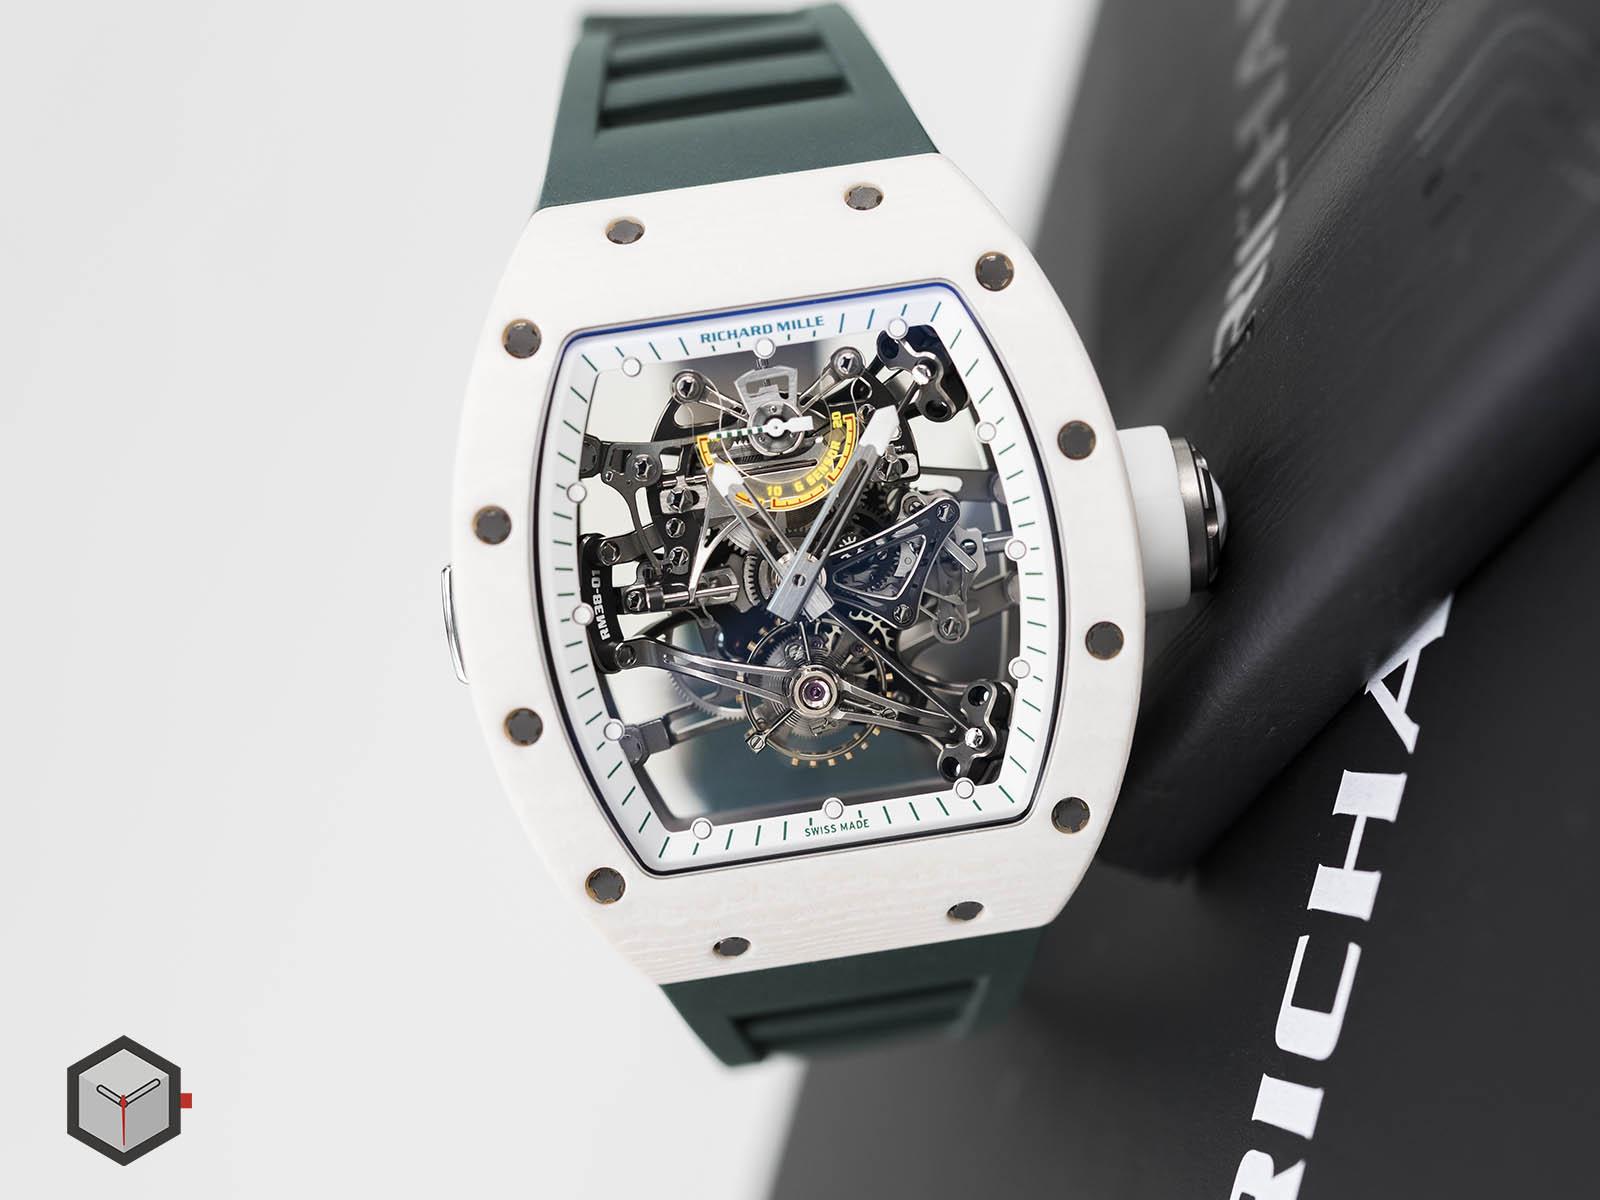 rm38-01-richard-mille-tourbillon-g-sensor-bubba-watson-3.jpg